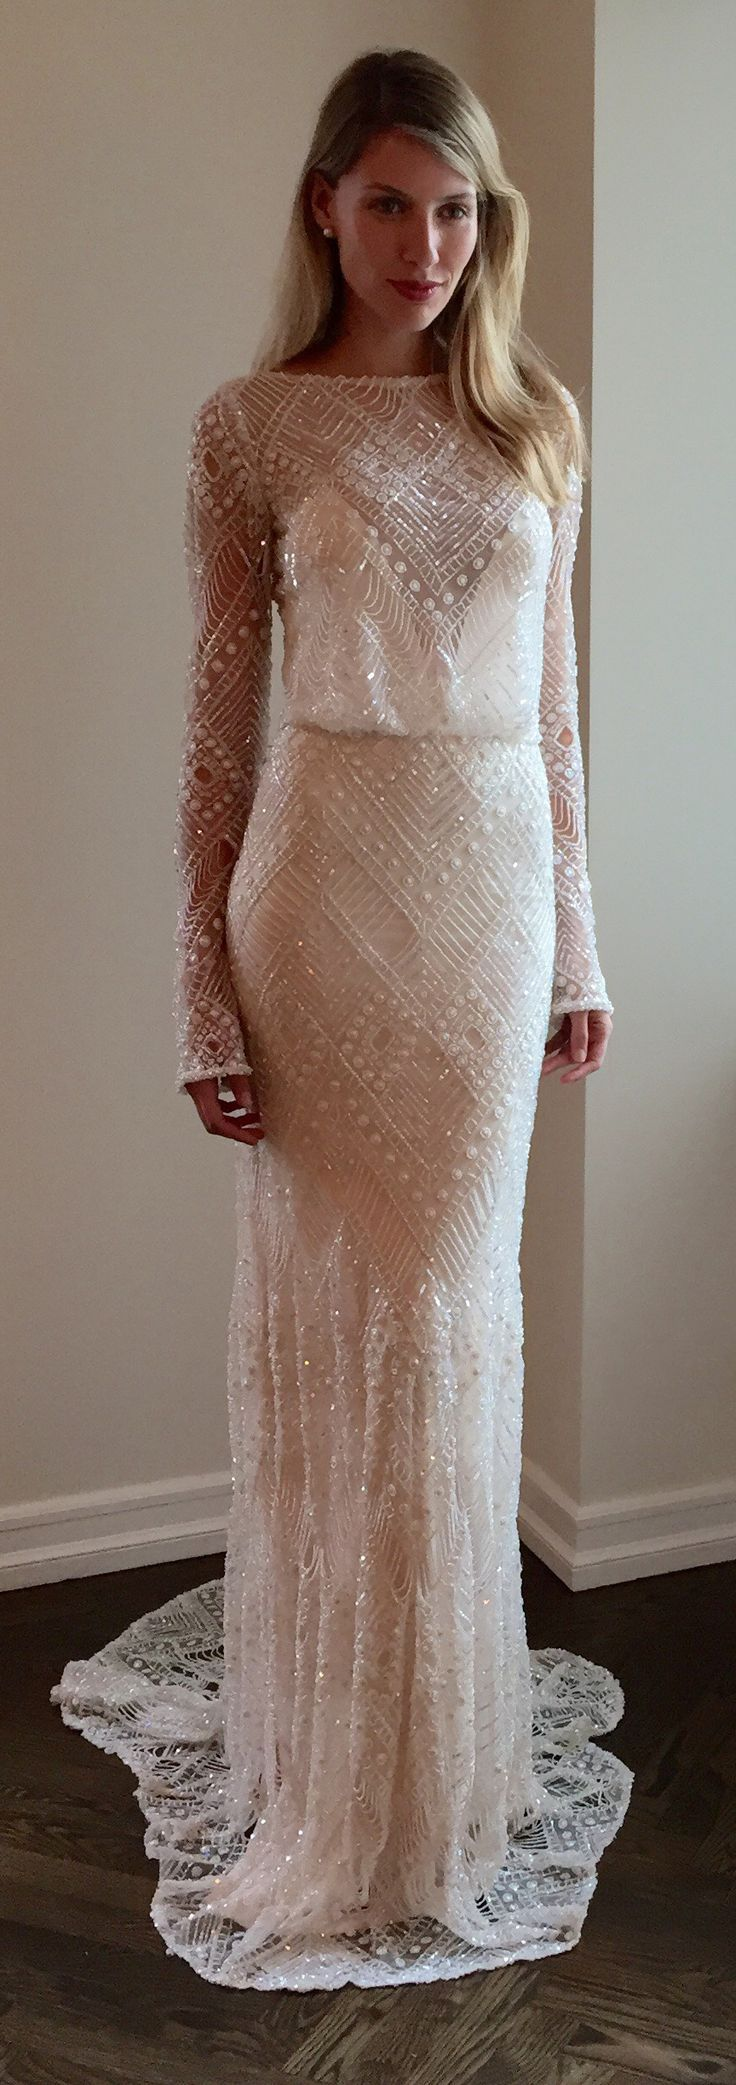 relaxed fit beaded wedding gown | Sleek Wedding Dresses | Pinterest ...